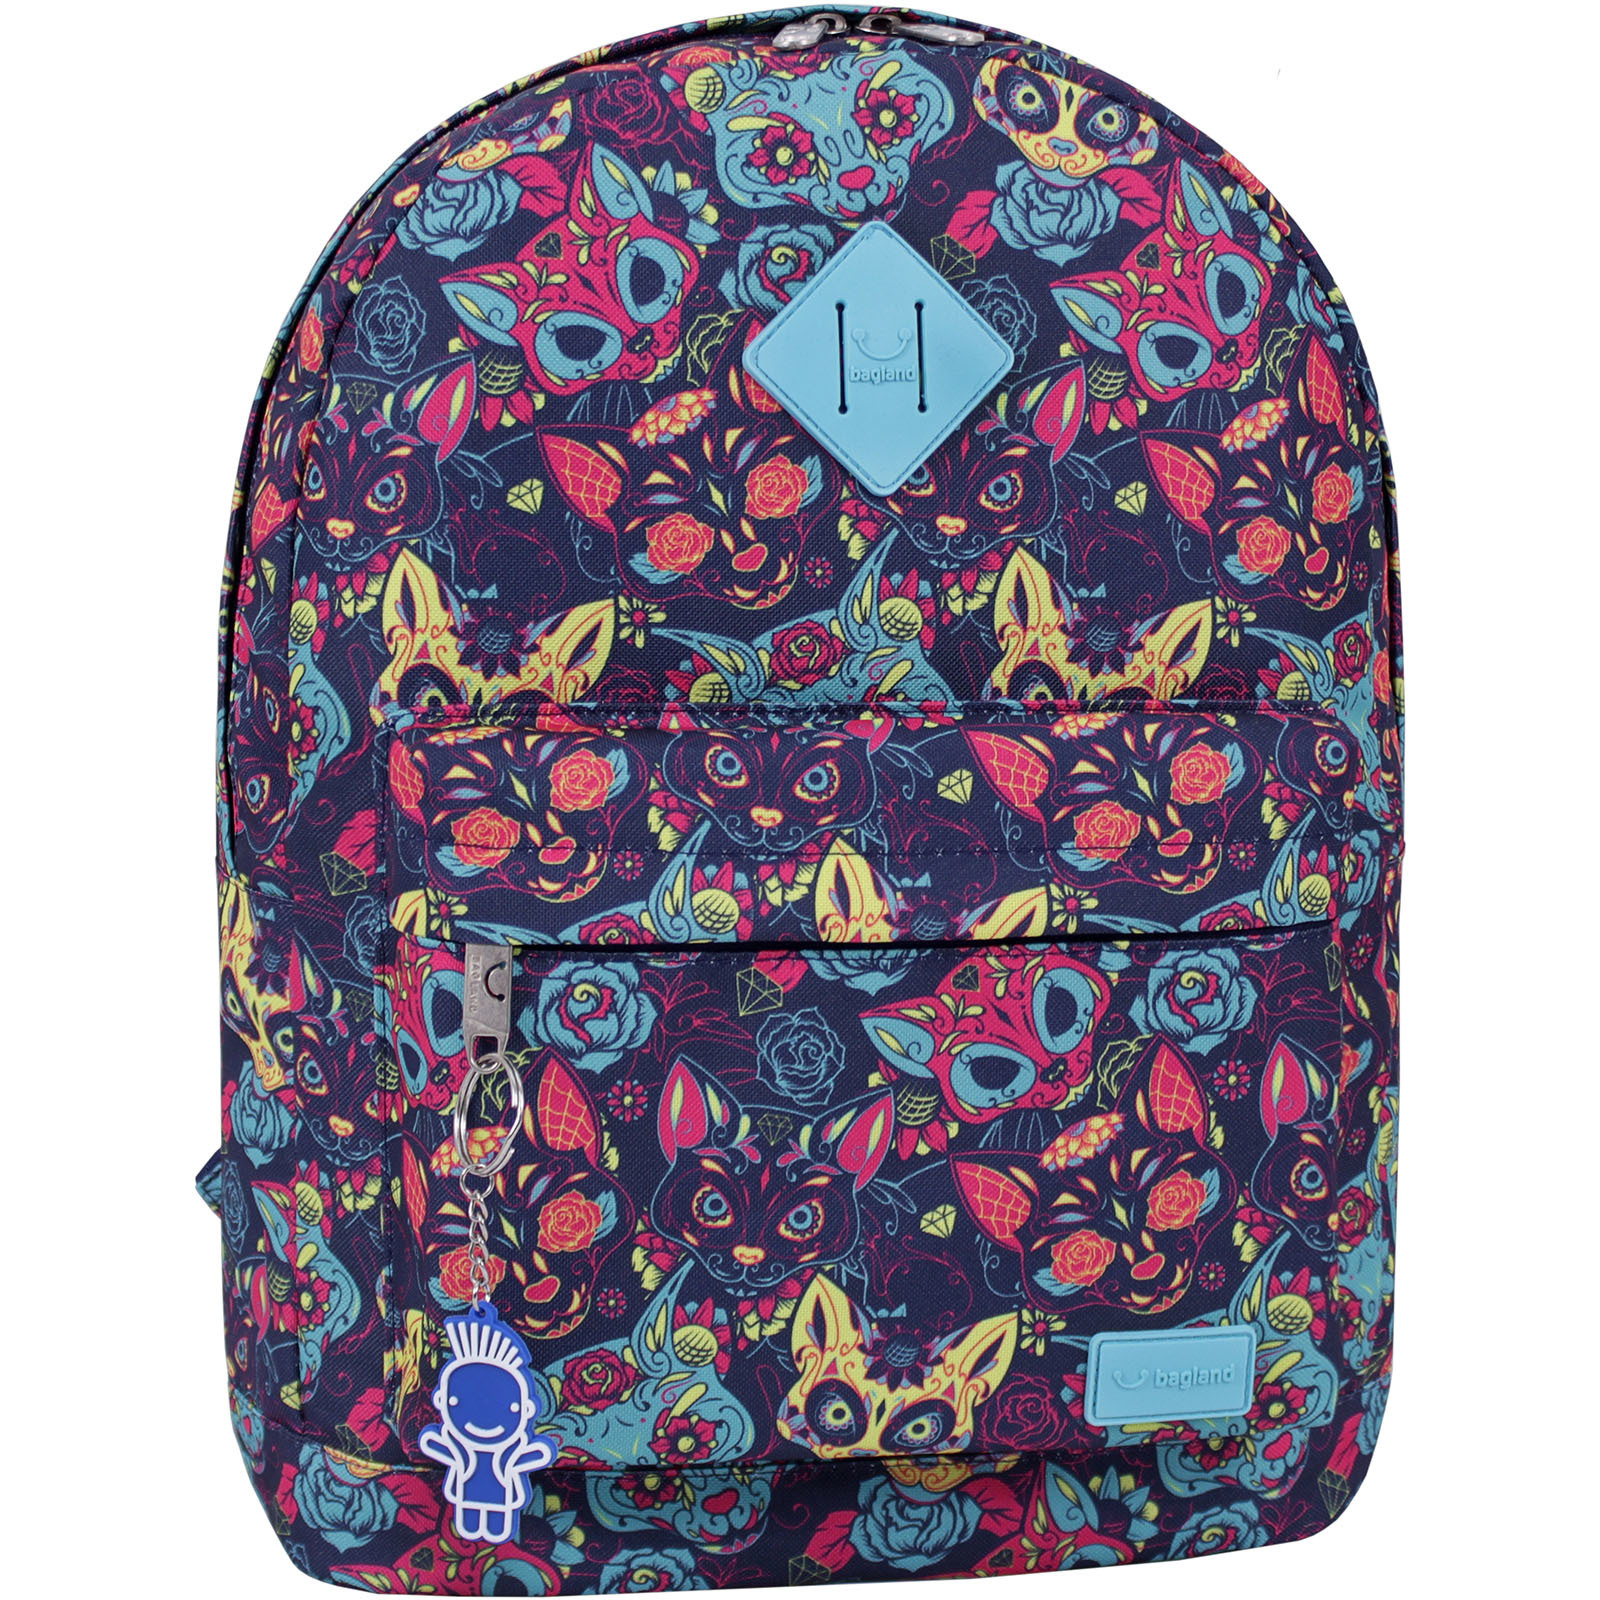 Городские рюкзаки Рюкзак Bagland Молодежный 17 л. сублимация 451 (00533664) IMG_9452_суб.451_.JPG